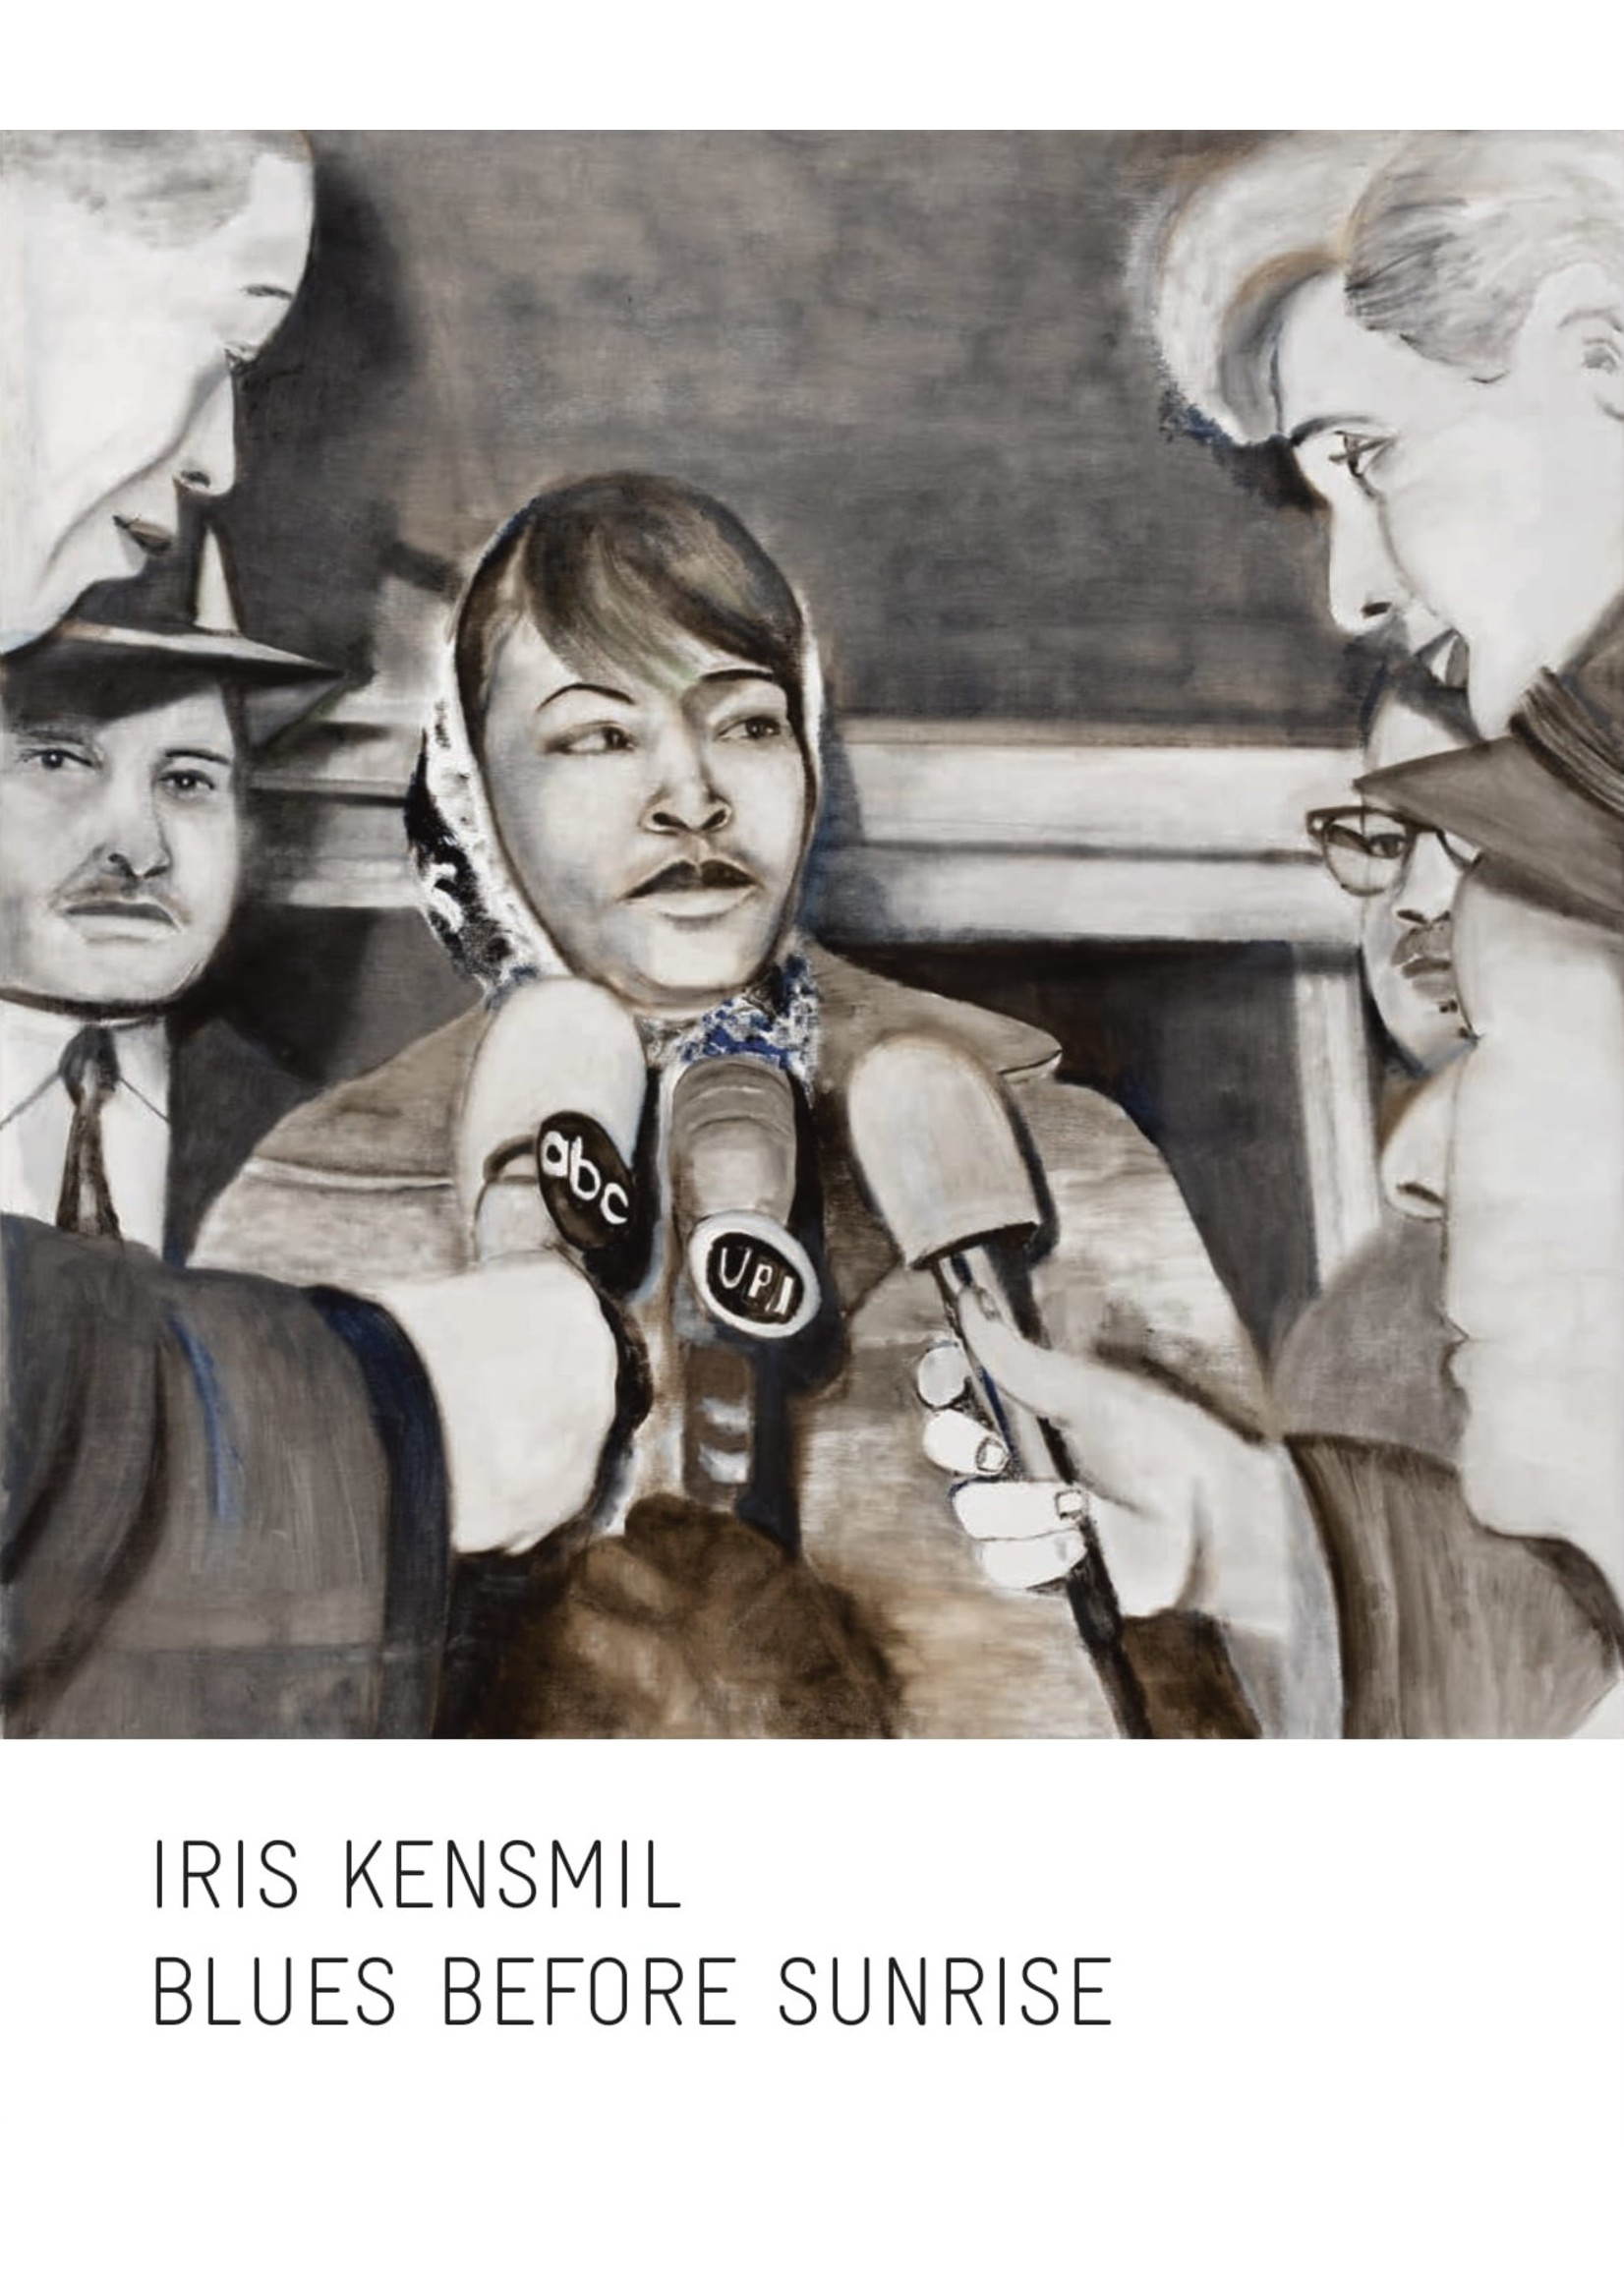 Iris Kensmil 'Blues before sunrise'